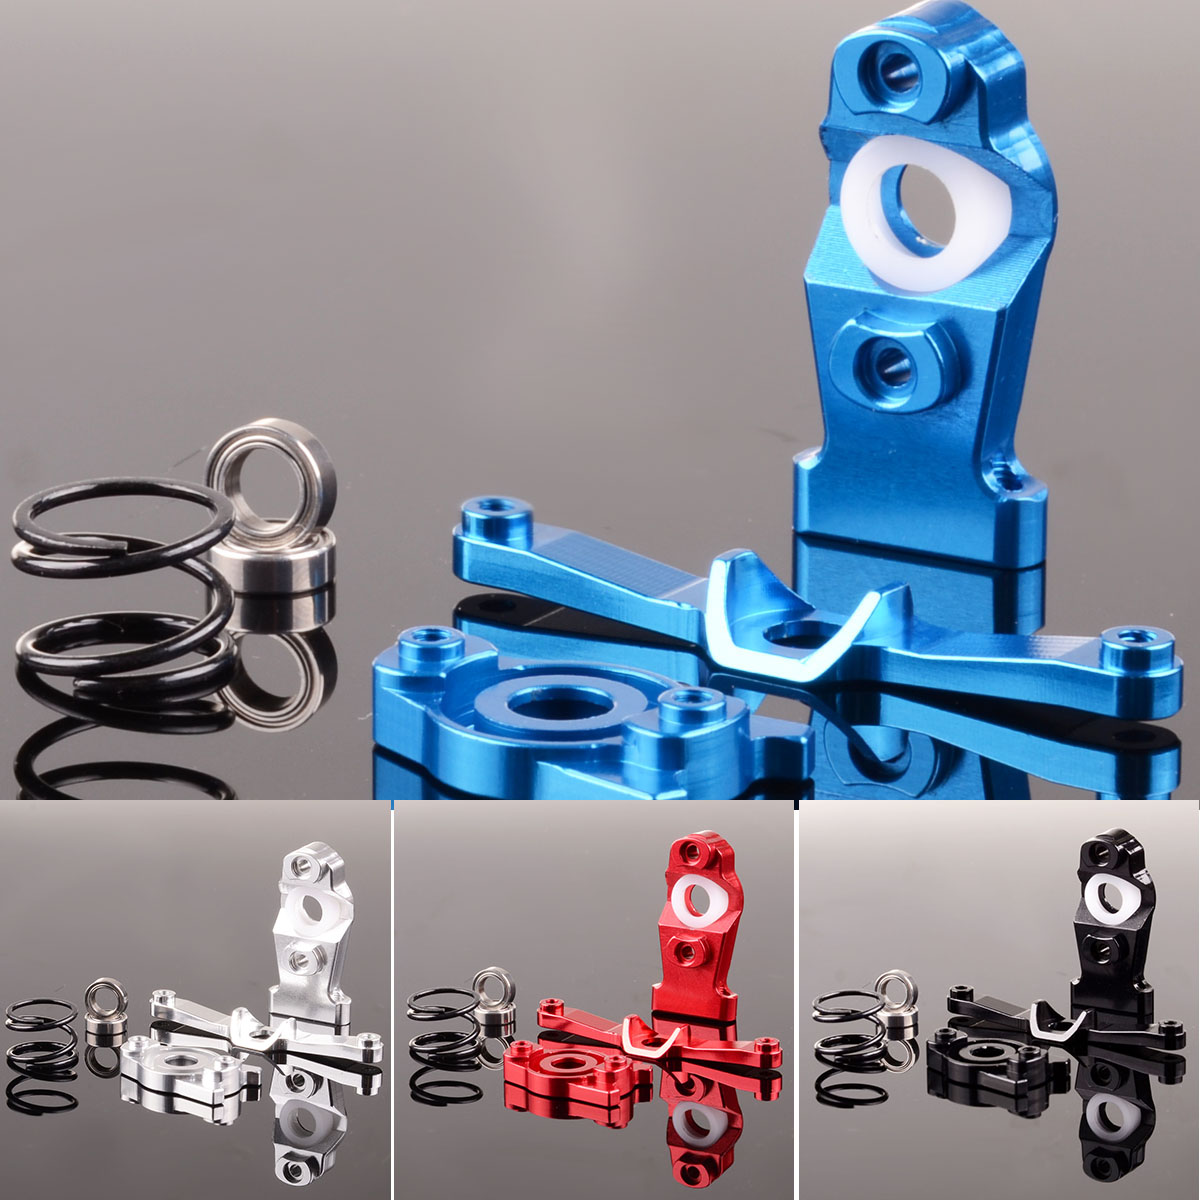 medium resolution of aluminum steering assembly erv048 for rc gpm traxxas 1 16 e revo slash summit 1 16